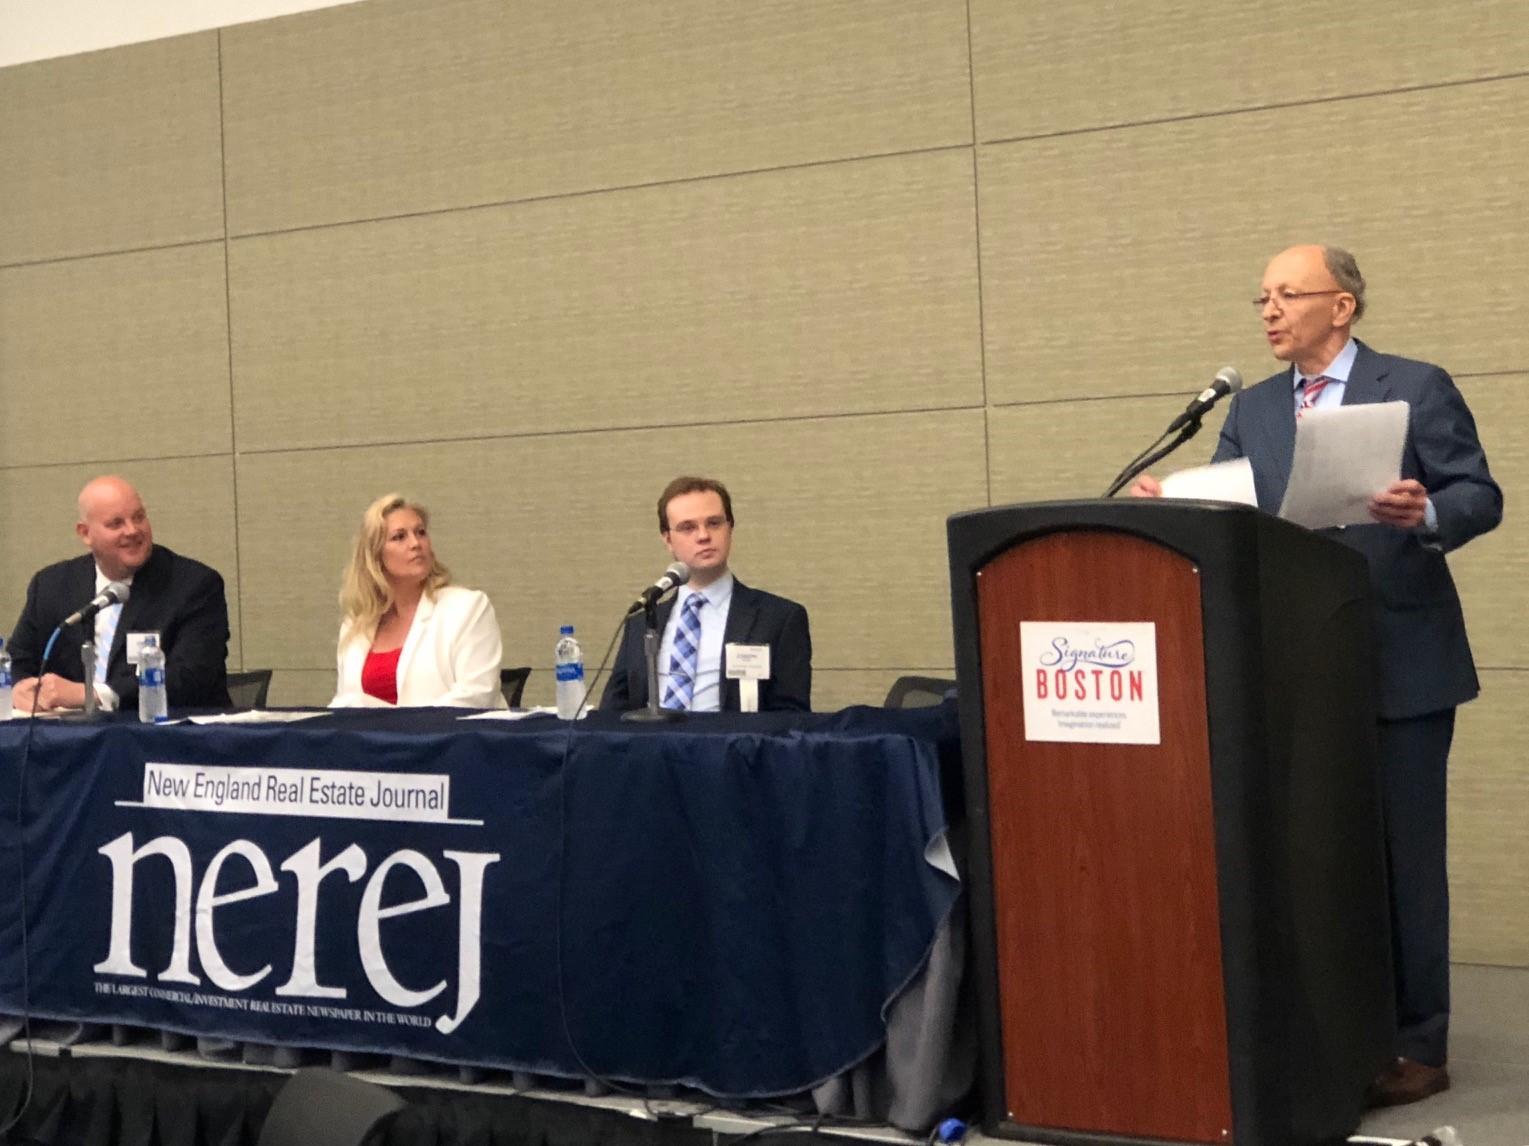 Shown:Greg McGee, LandLease, Deborah Griffin, Nickerson RE, and Joseph Stepp, Licata Risk Advisors - moderating the panel, Frank Licata, Licata Risk Advisors.